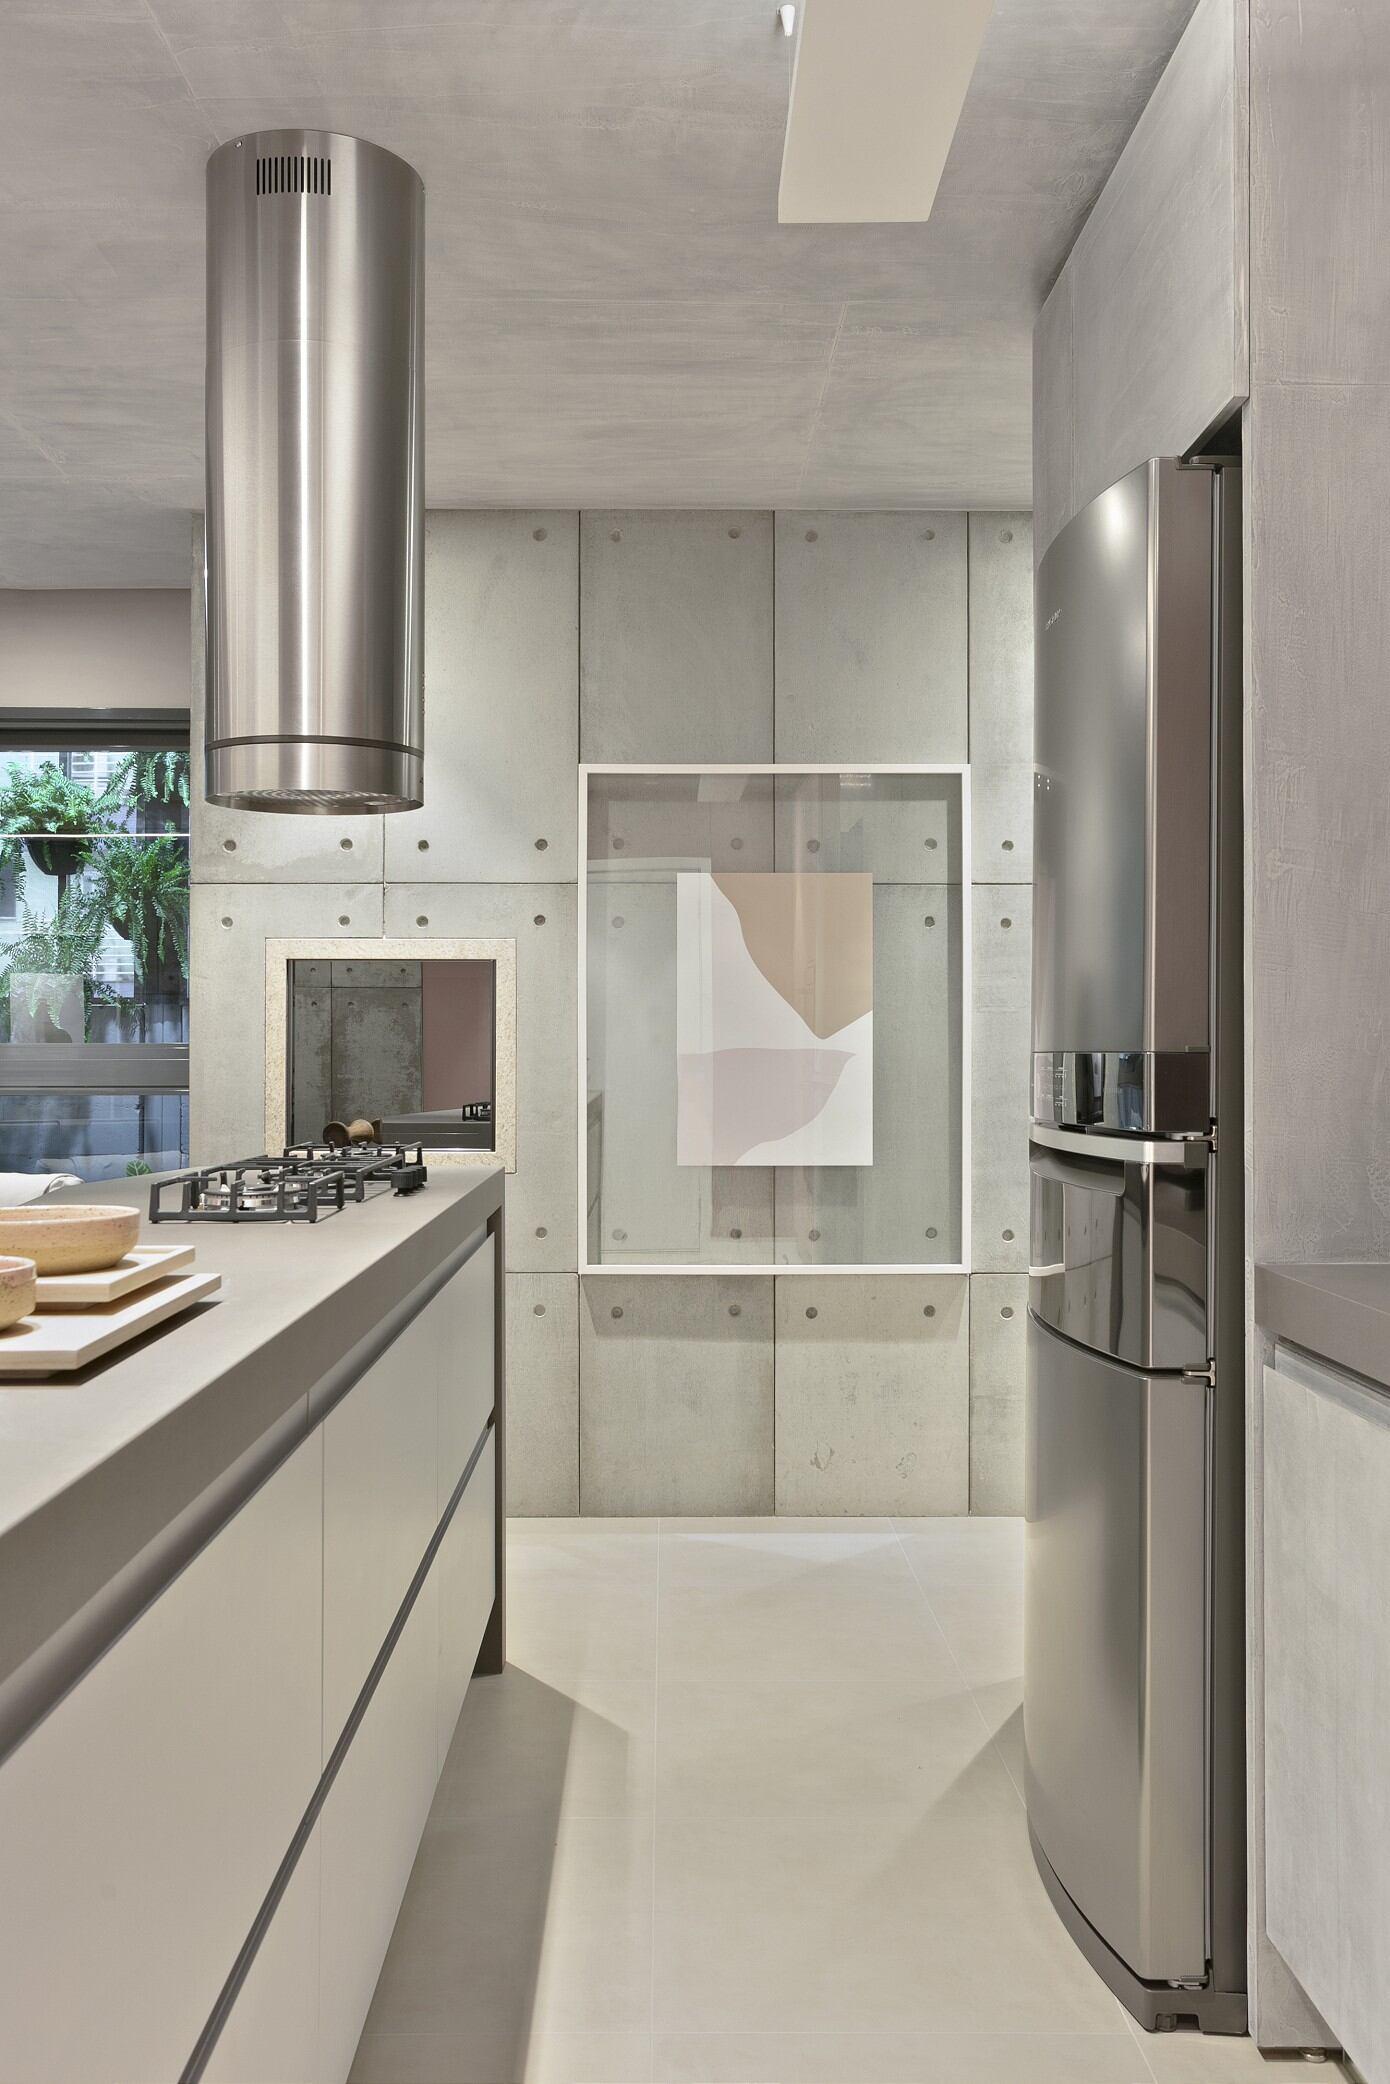 Arch 103 Apartment by Bohrer Arquitetura